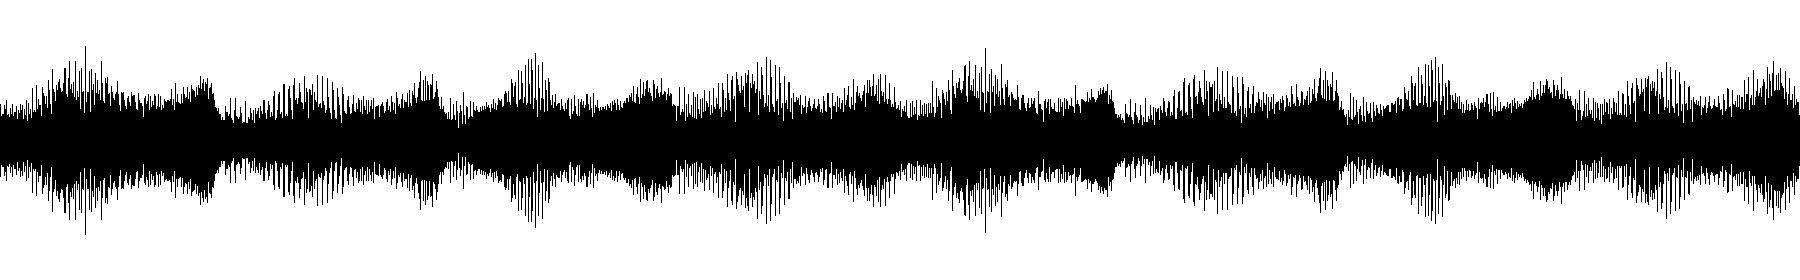 120 a harmonicchords sp 01